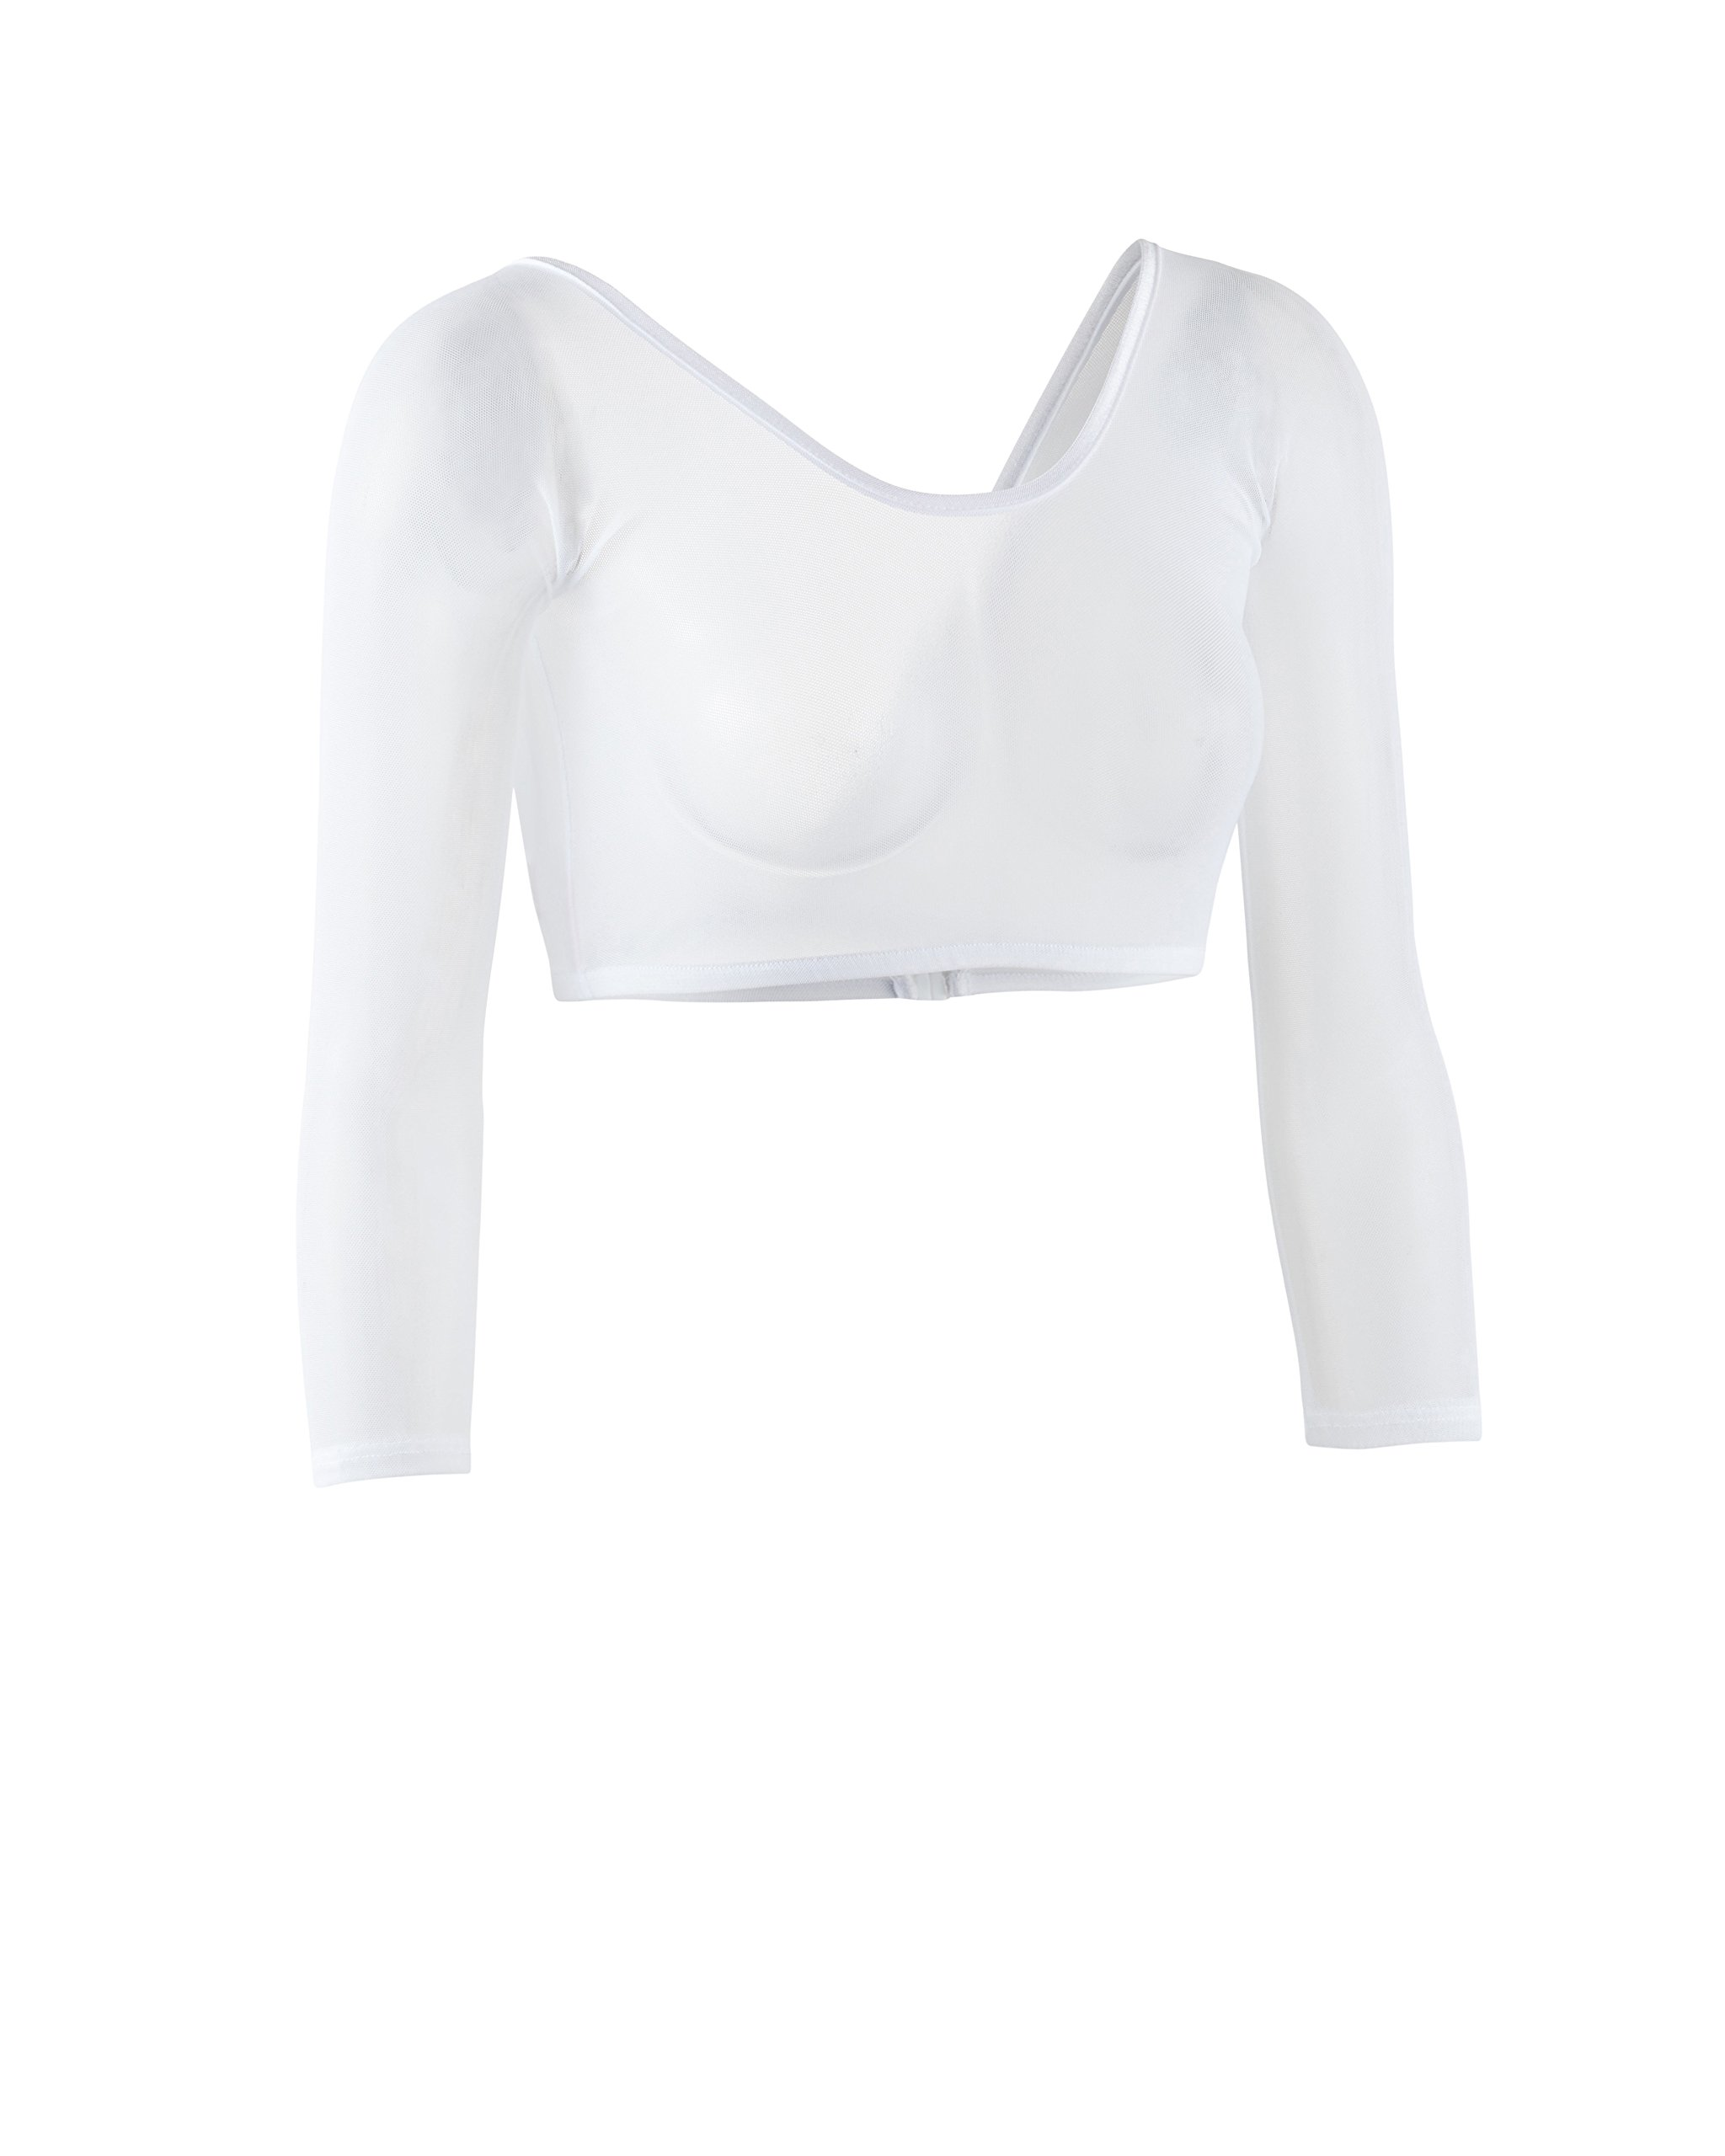 Sleevey Wonders Women's Basic 3/4 Length Slip-on Mesh Sleeves XL White by Sleevey Wonders (Image #2)